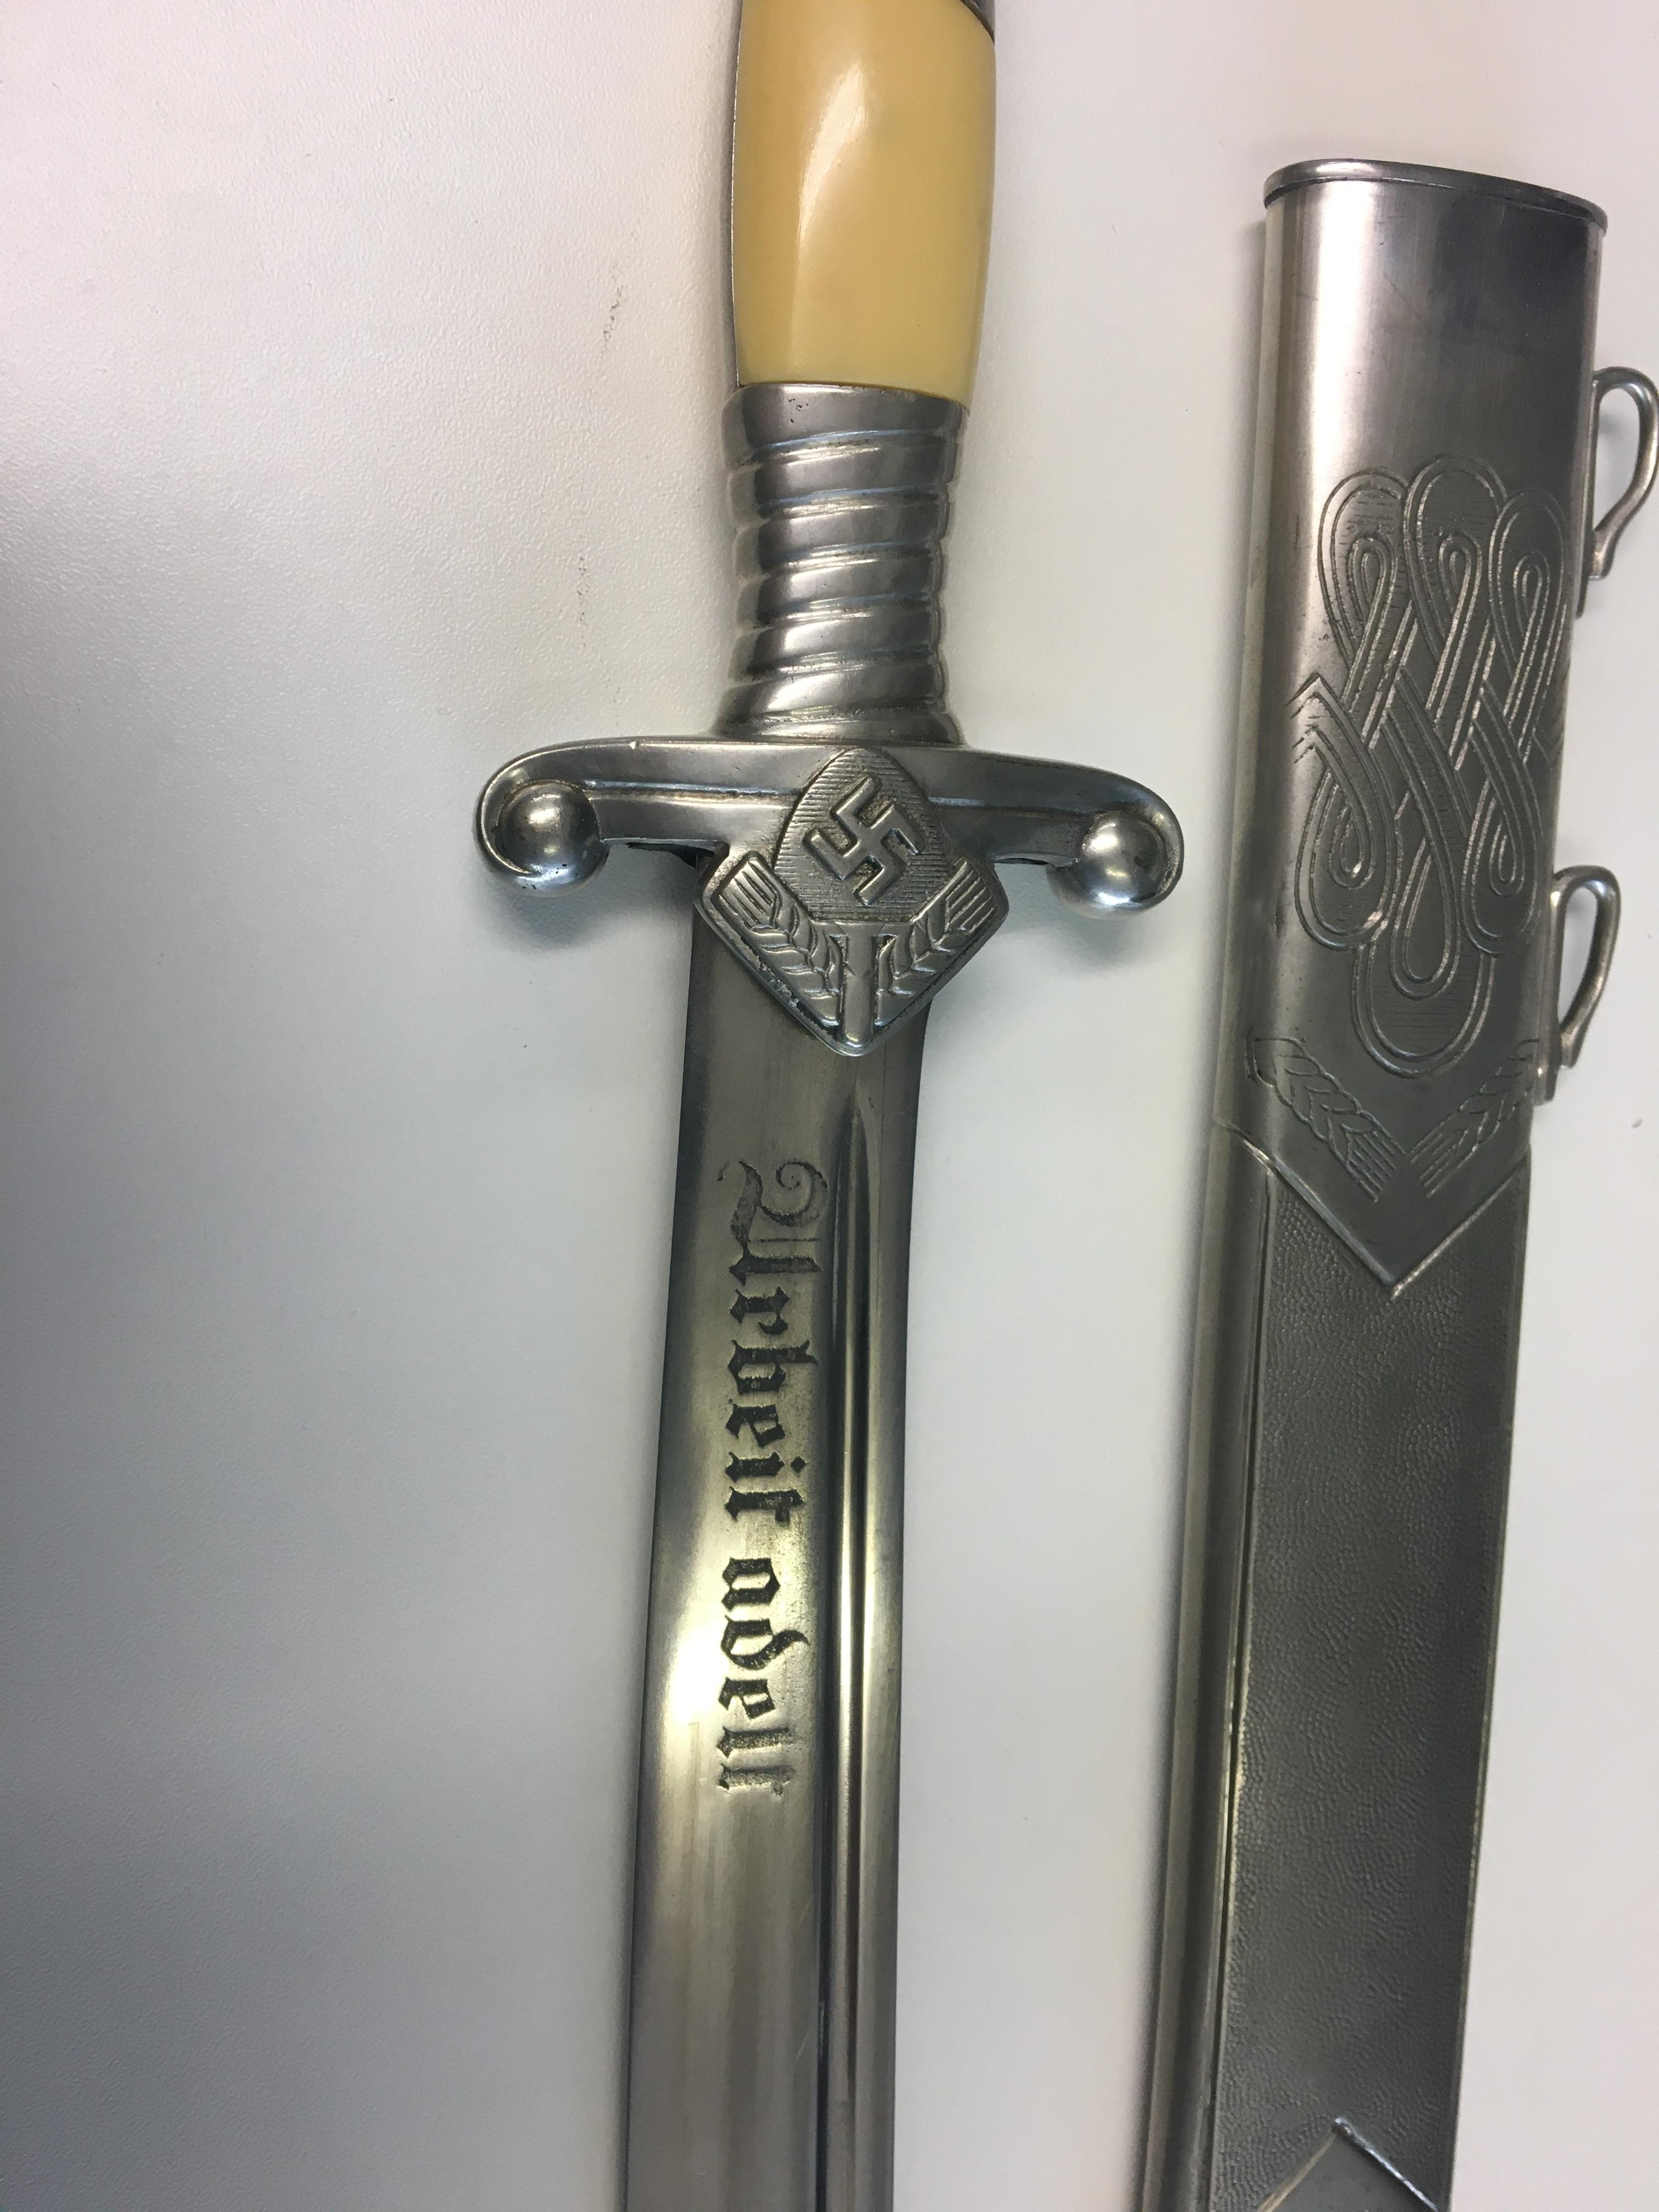 WWII German RAD Leaders Hewer and sheath, blade by Eickhorn. - Image 4 of 8